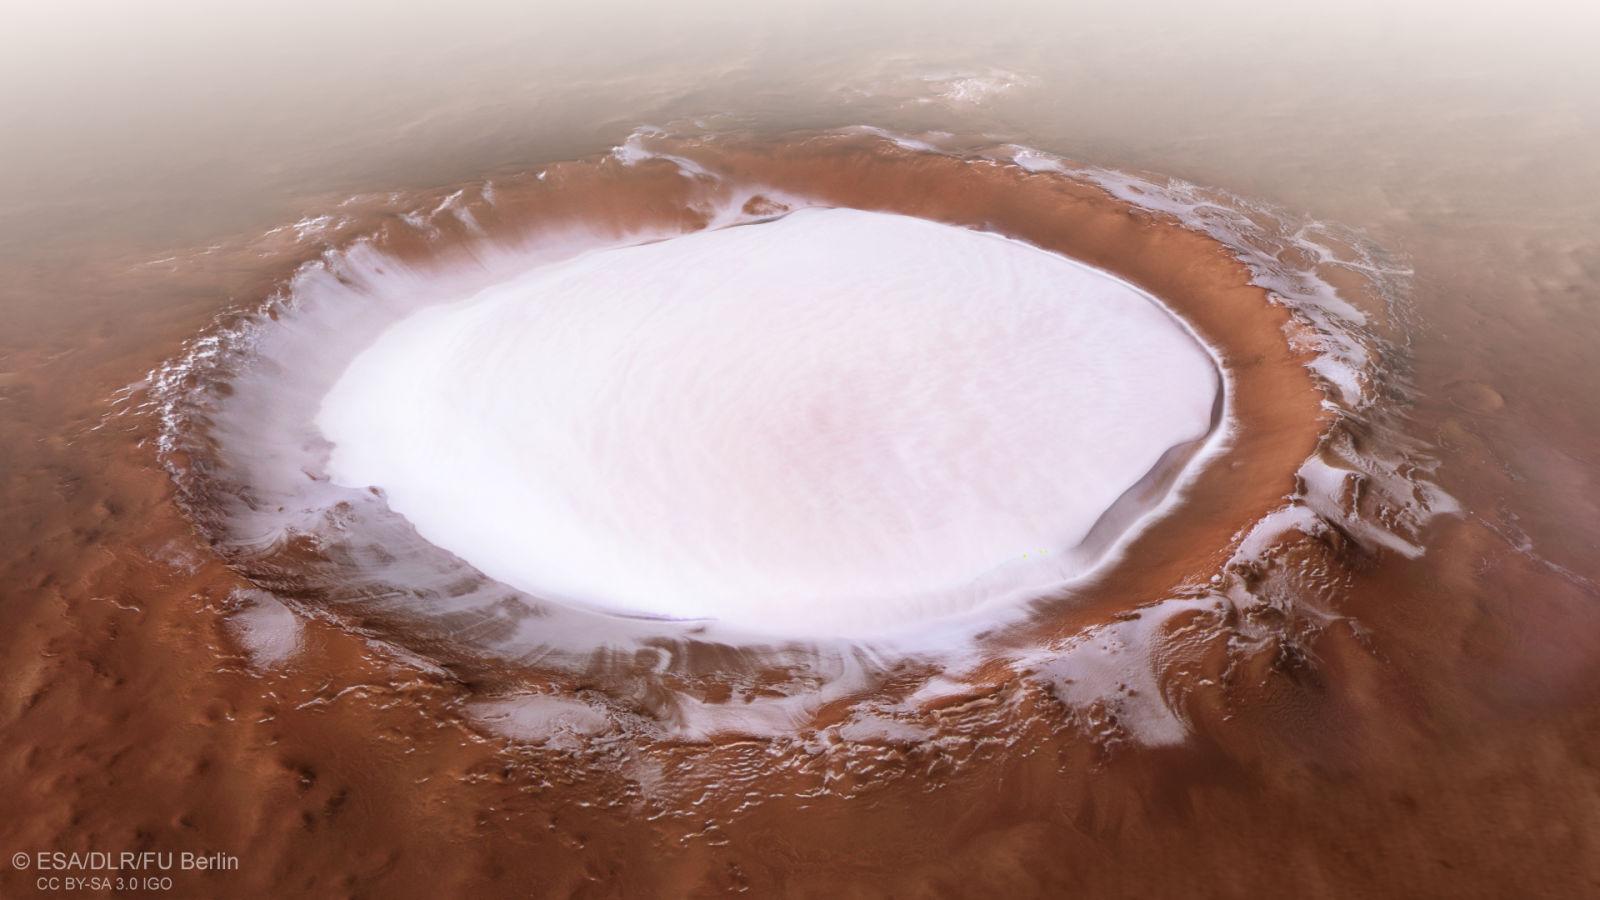 Korolev krater op Mars